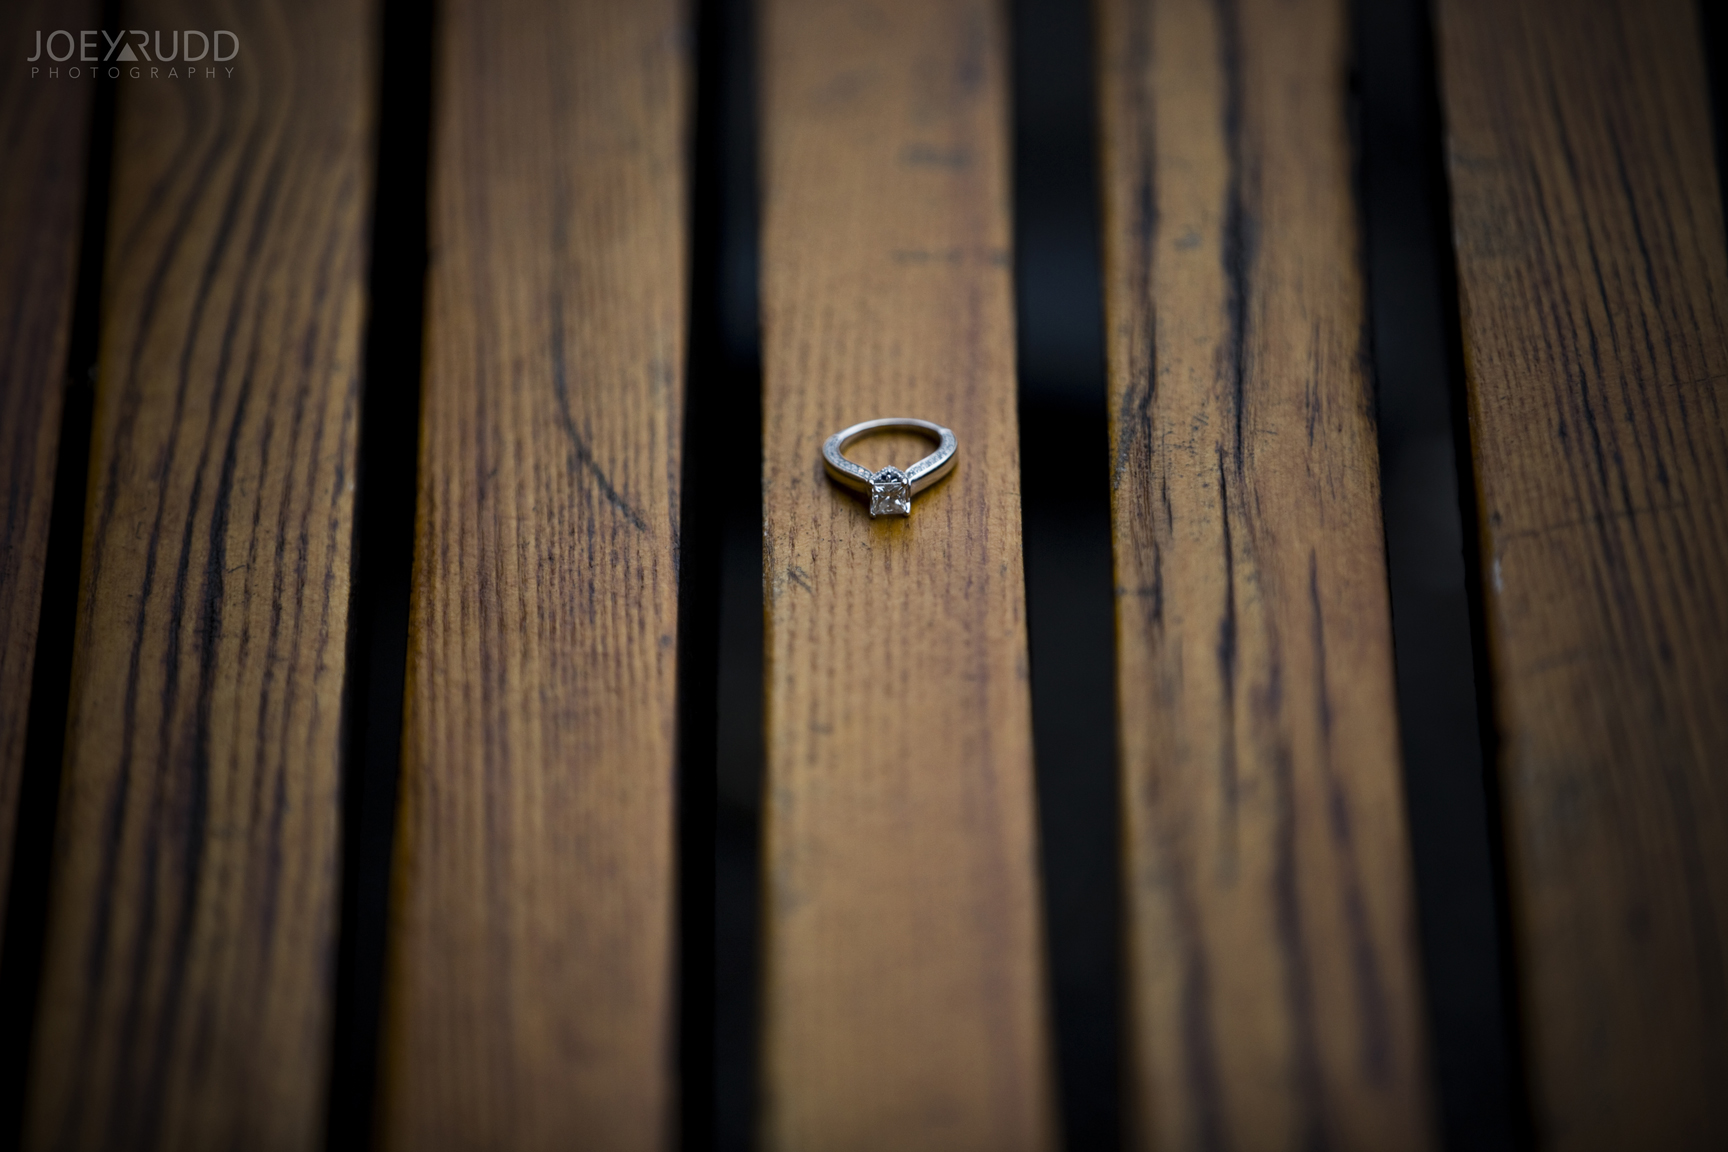 Joey Rudd Photography Ottawa Wedding Photographer Engagement Ring